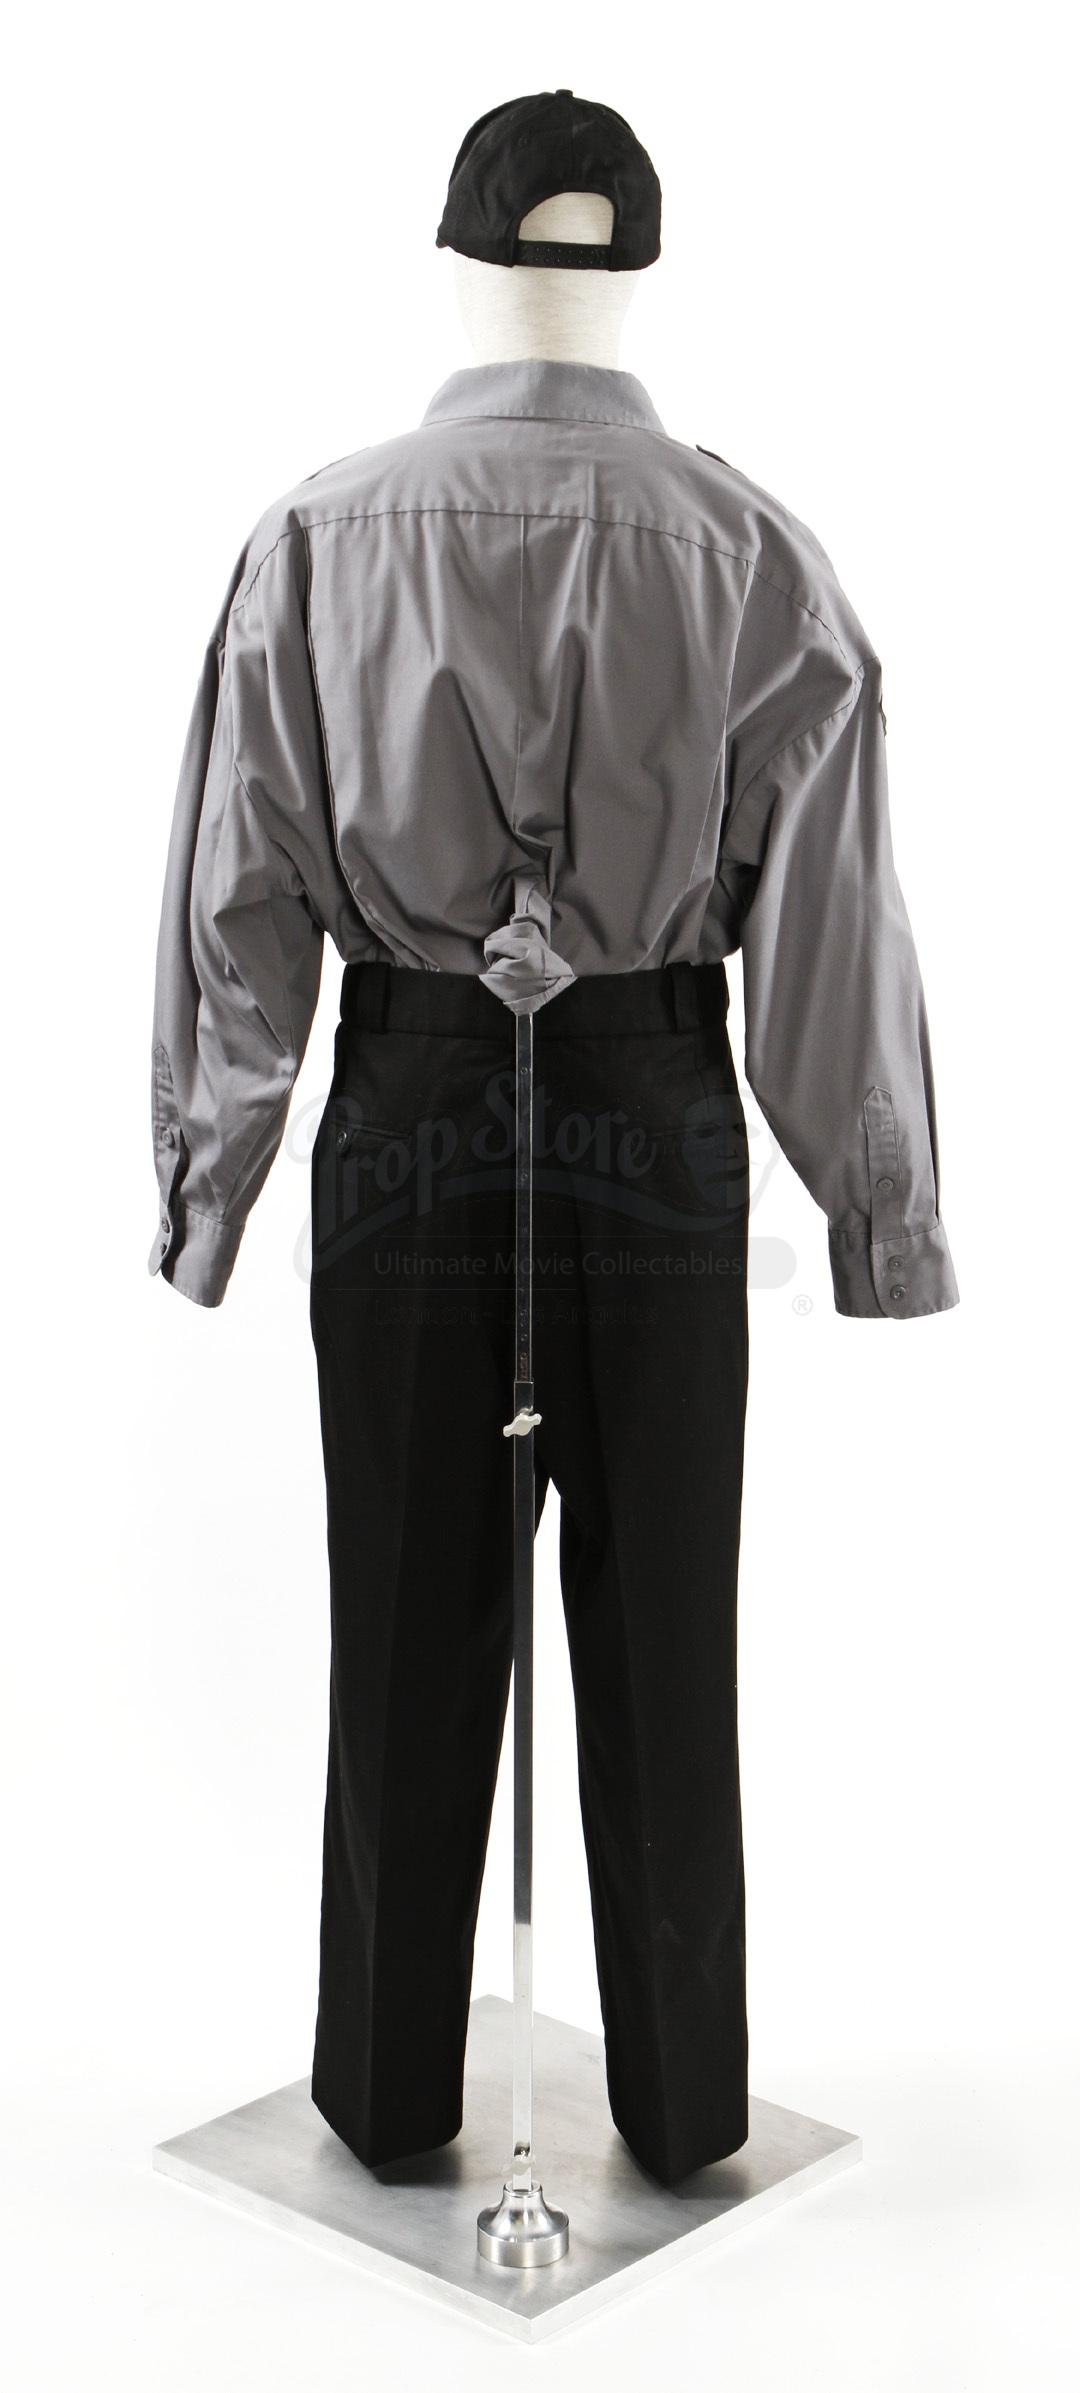 Tweet  sc 1 st  PropStore.com & Encom Security Guard Uniform | Prop Store - Ultimate Movie Collectables